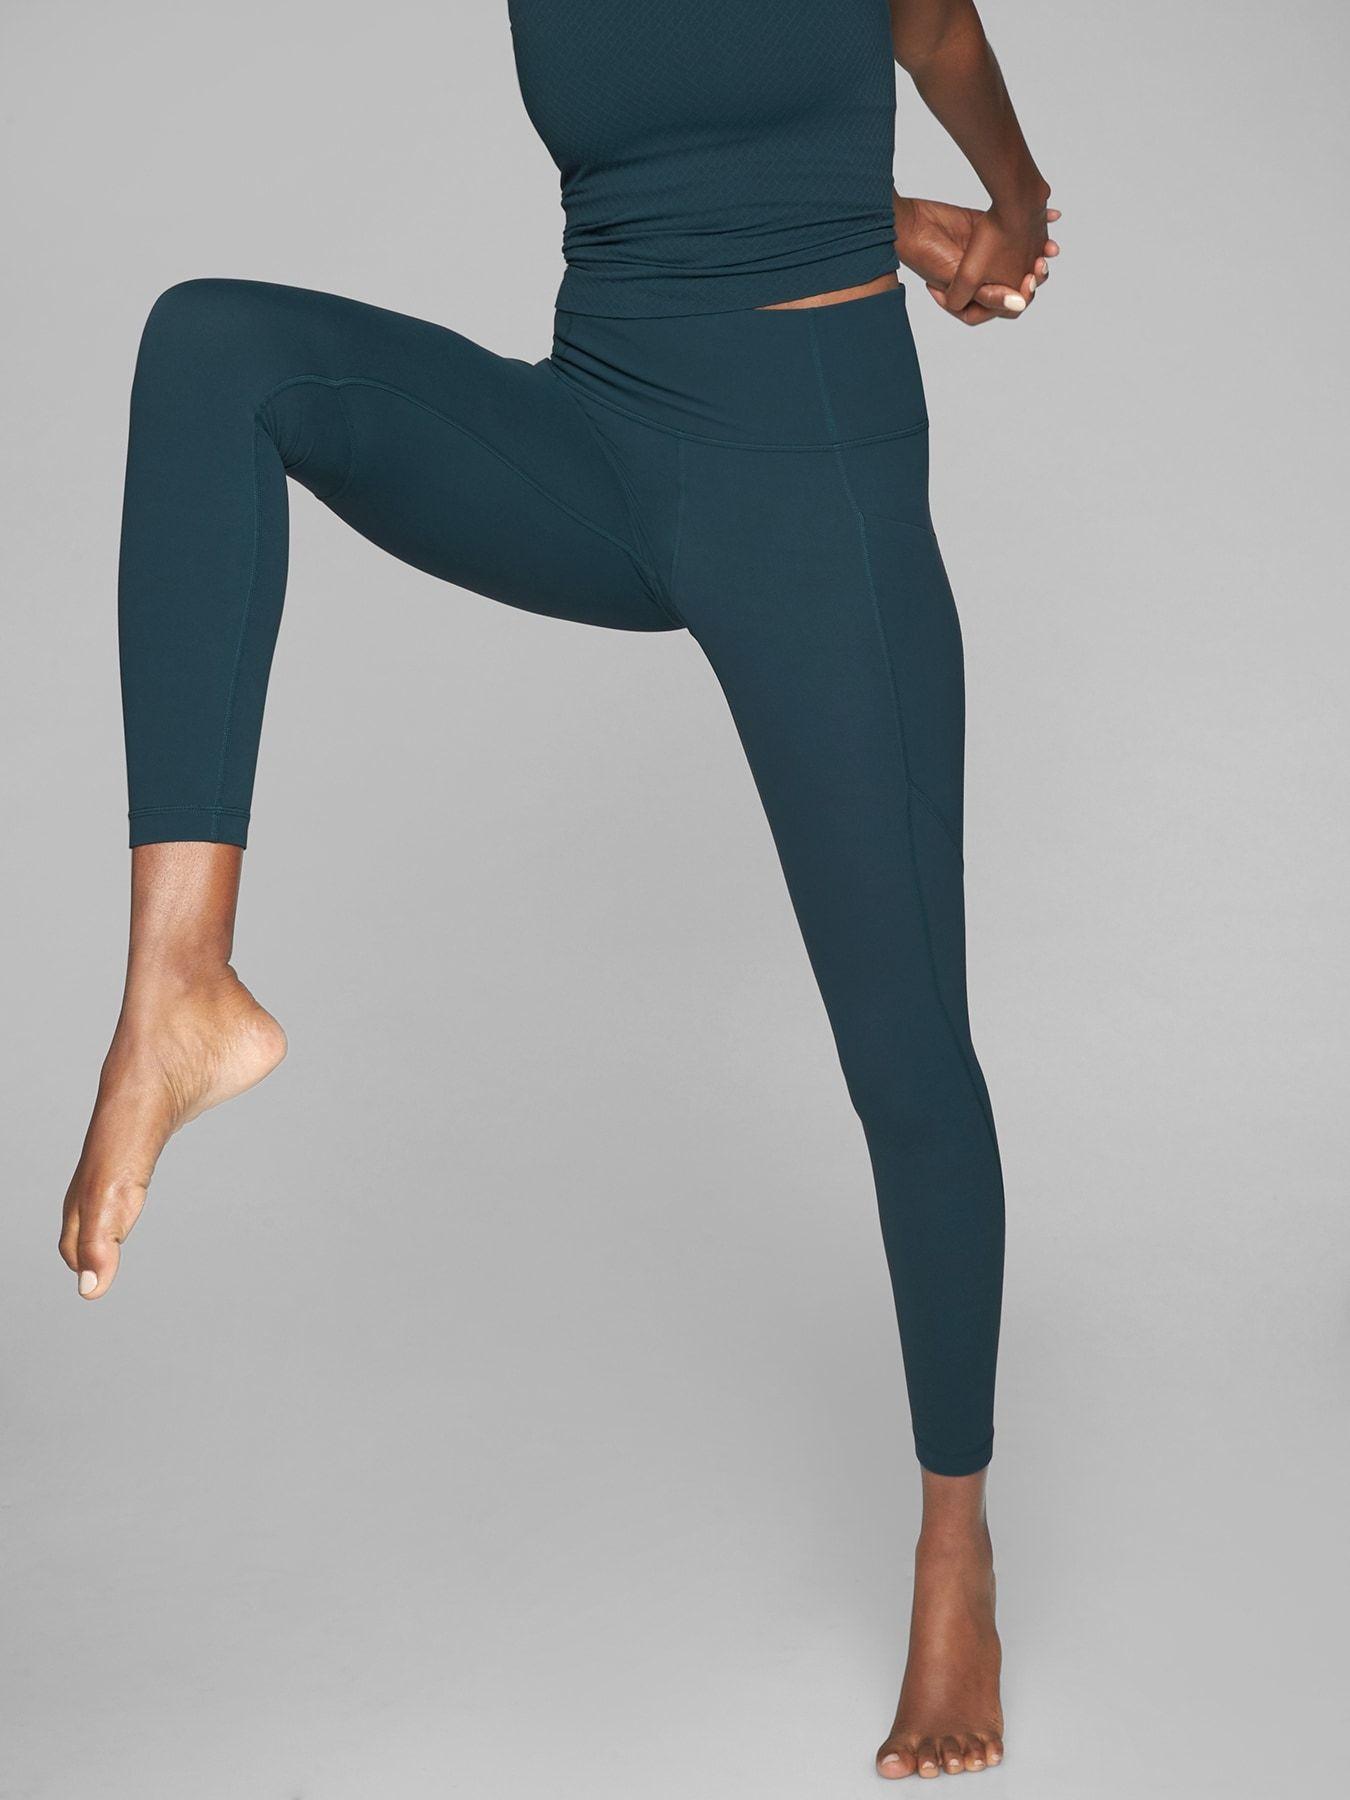 0a21878e2cdb7 Powervita fabric with pockets. Athleta - Page Not Found. Stash pocket  salutation tight | Abyss, Petite Medium